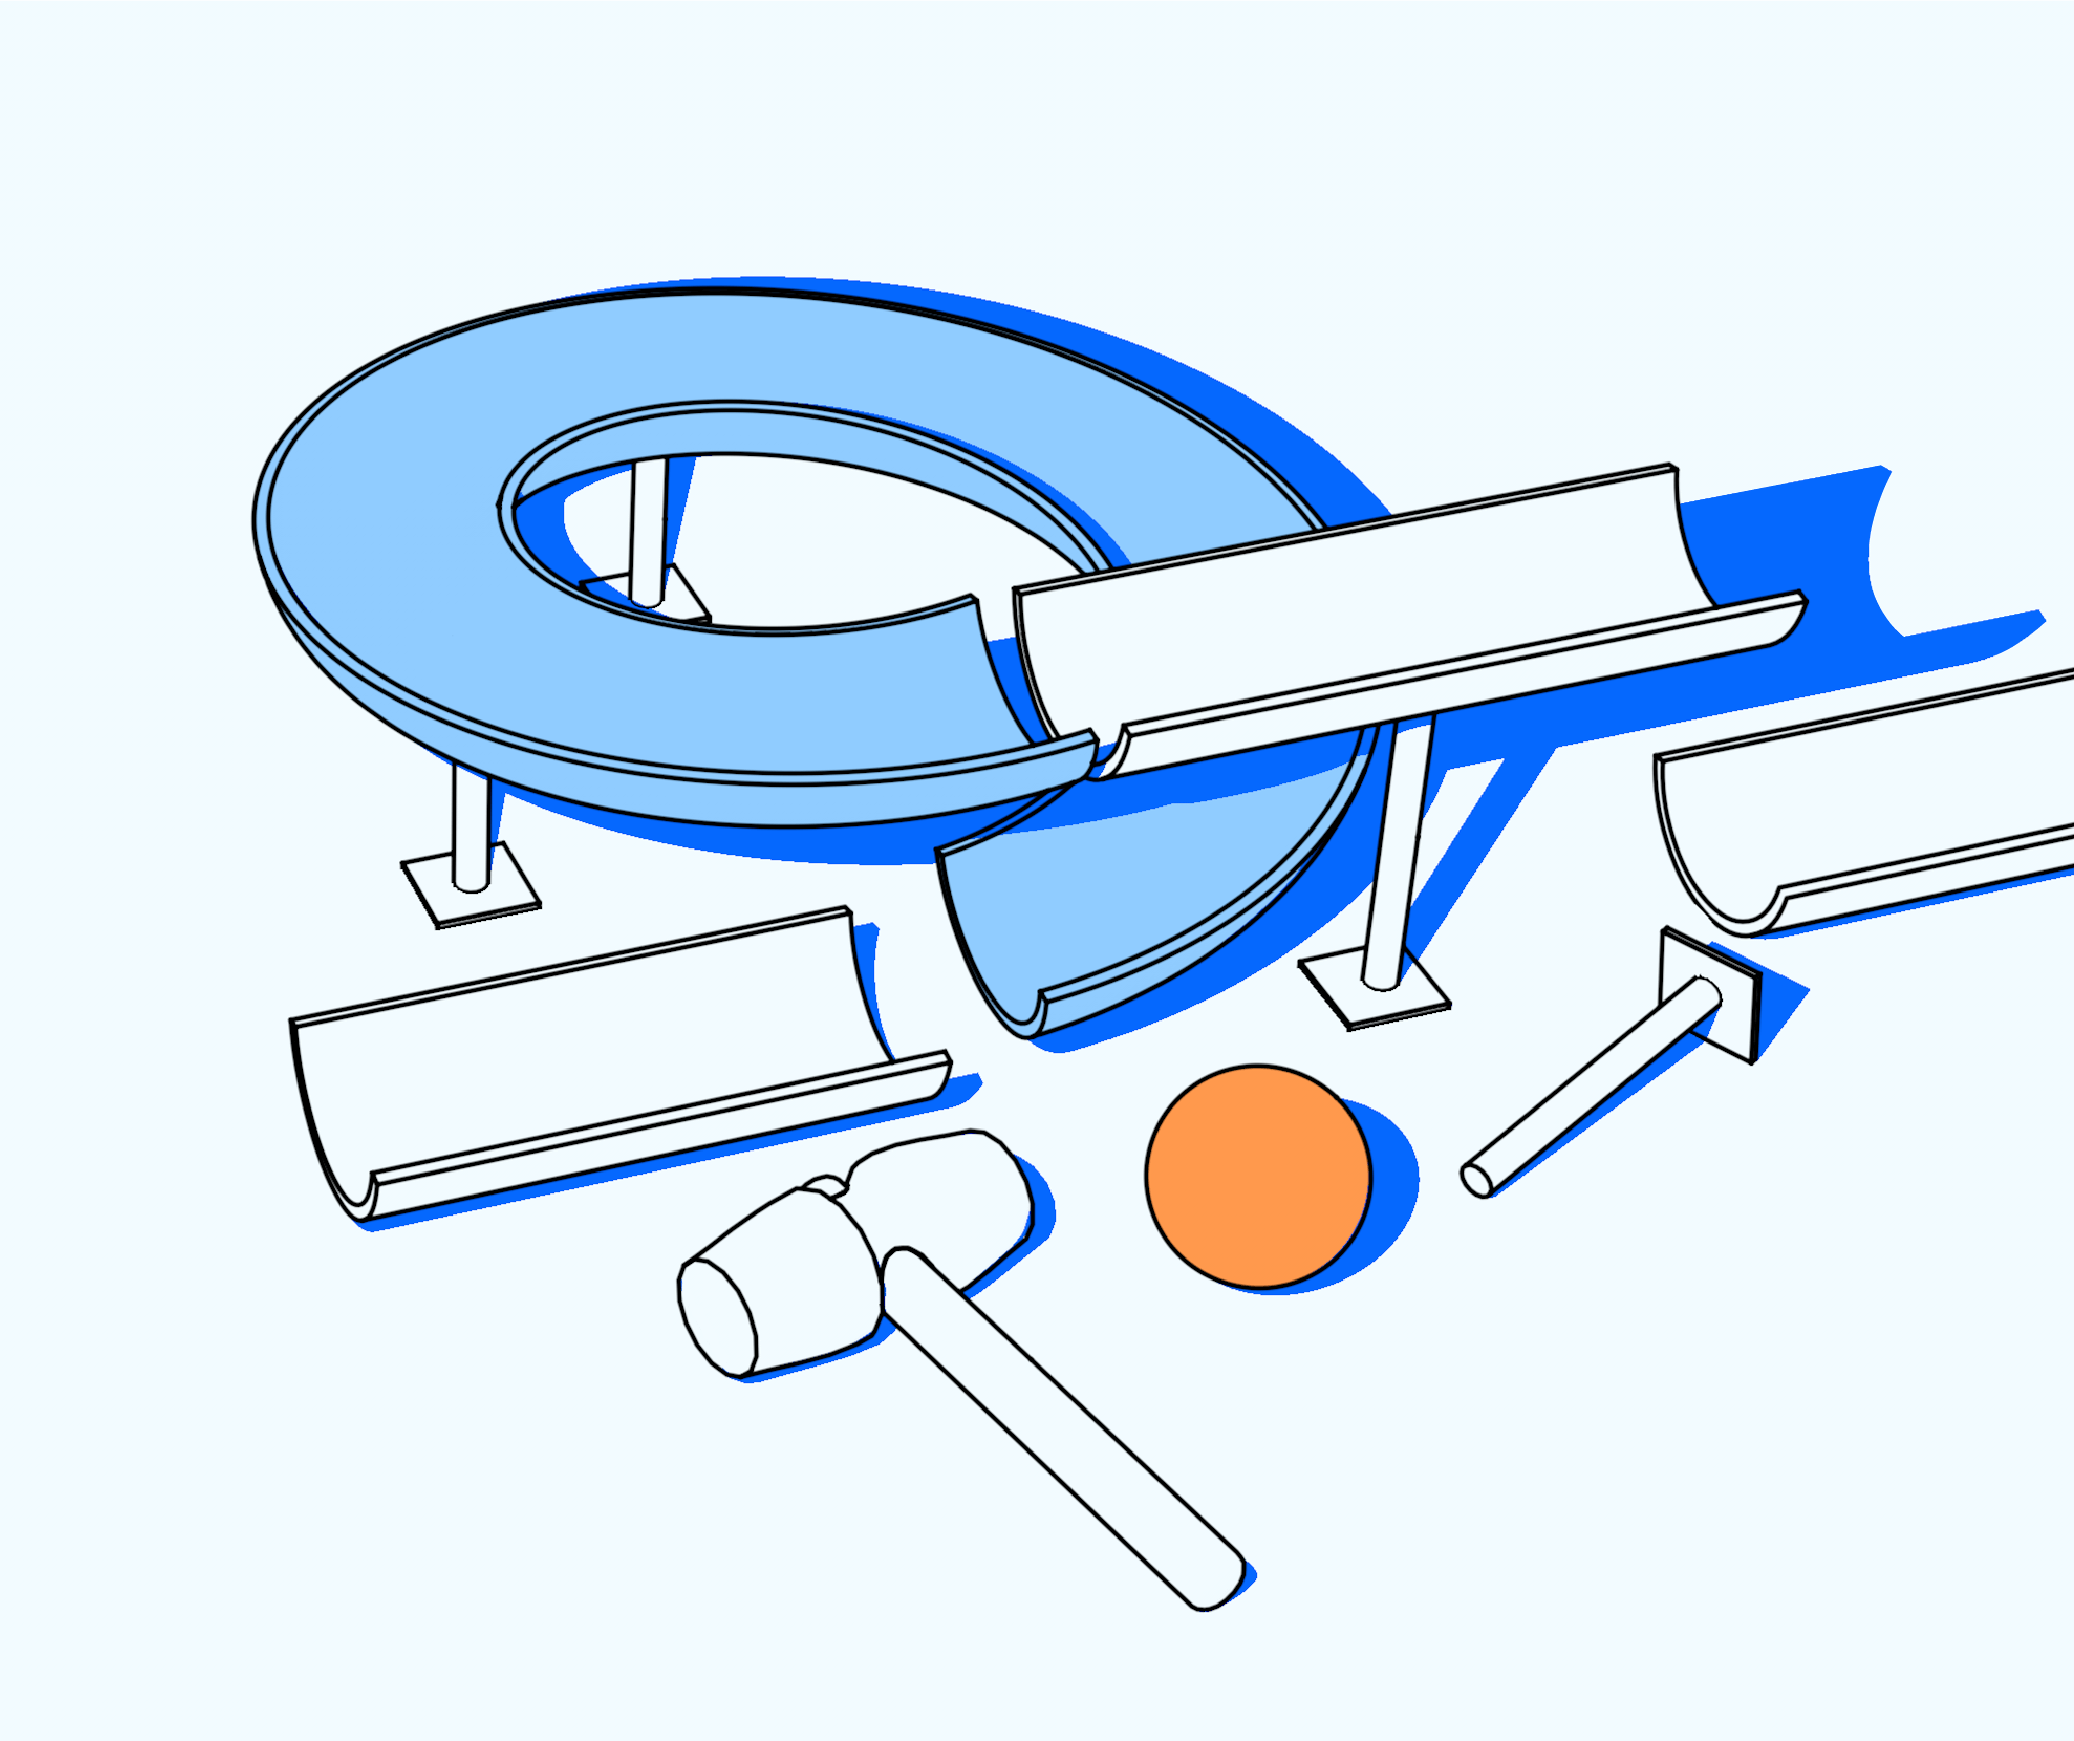 agile-product-development-thumbnail